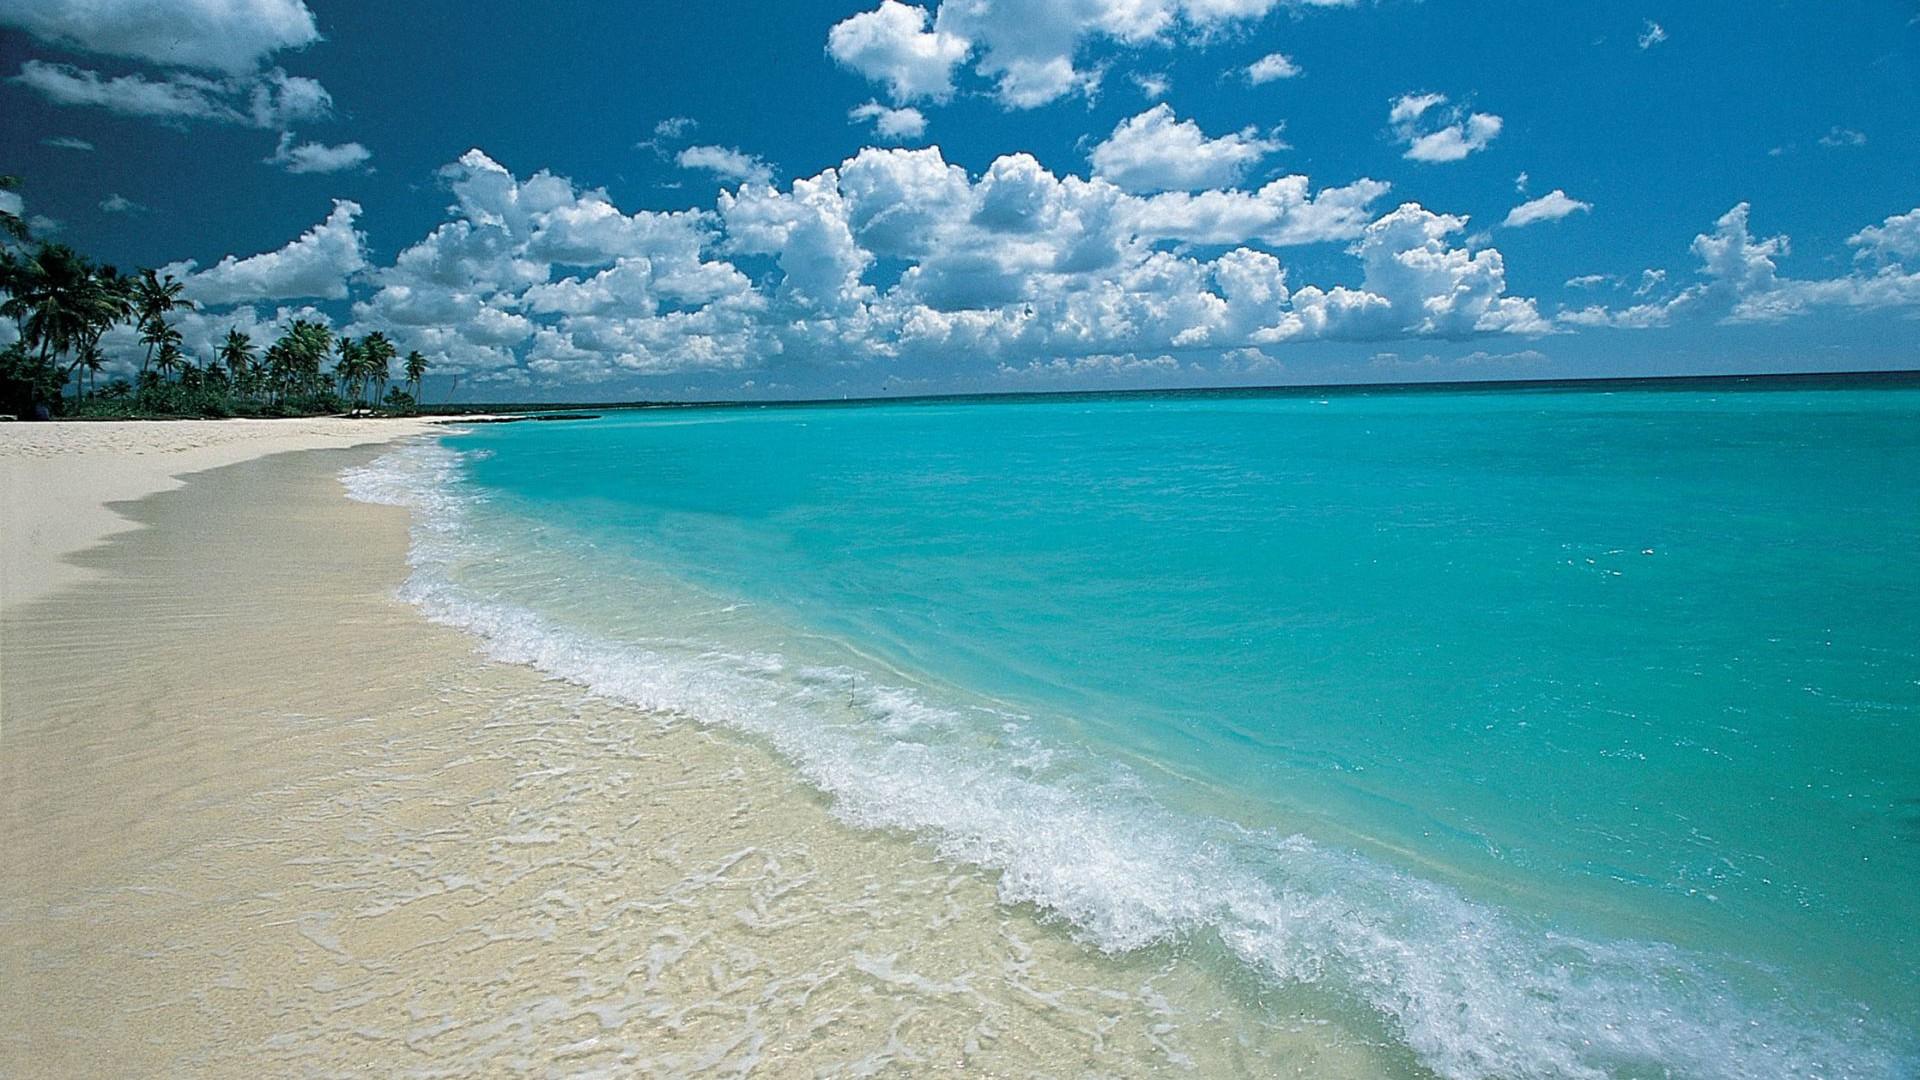 Punta Cana beach · Punta Cana